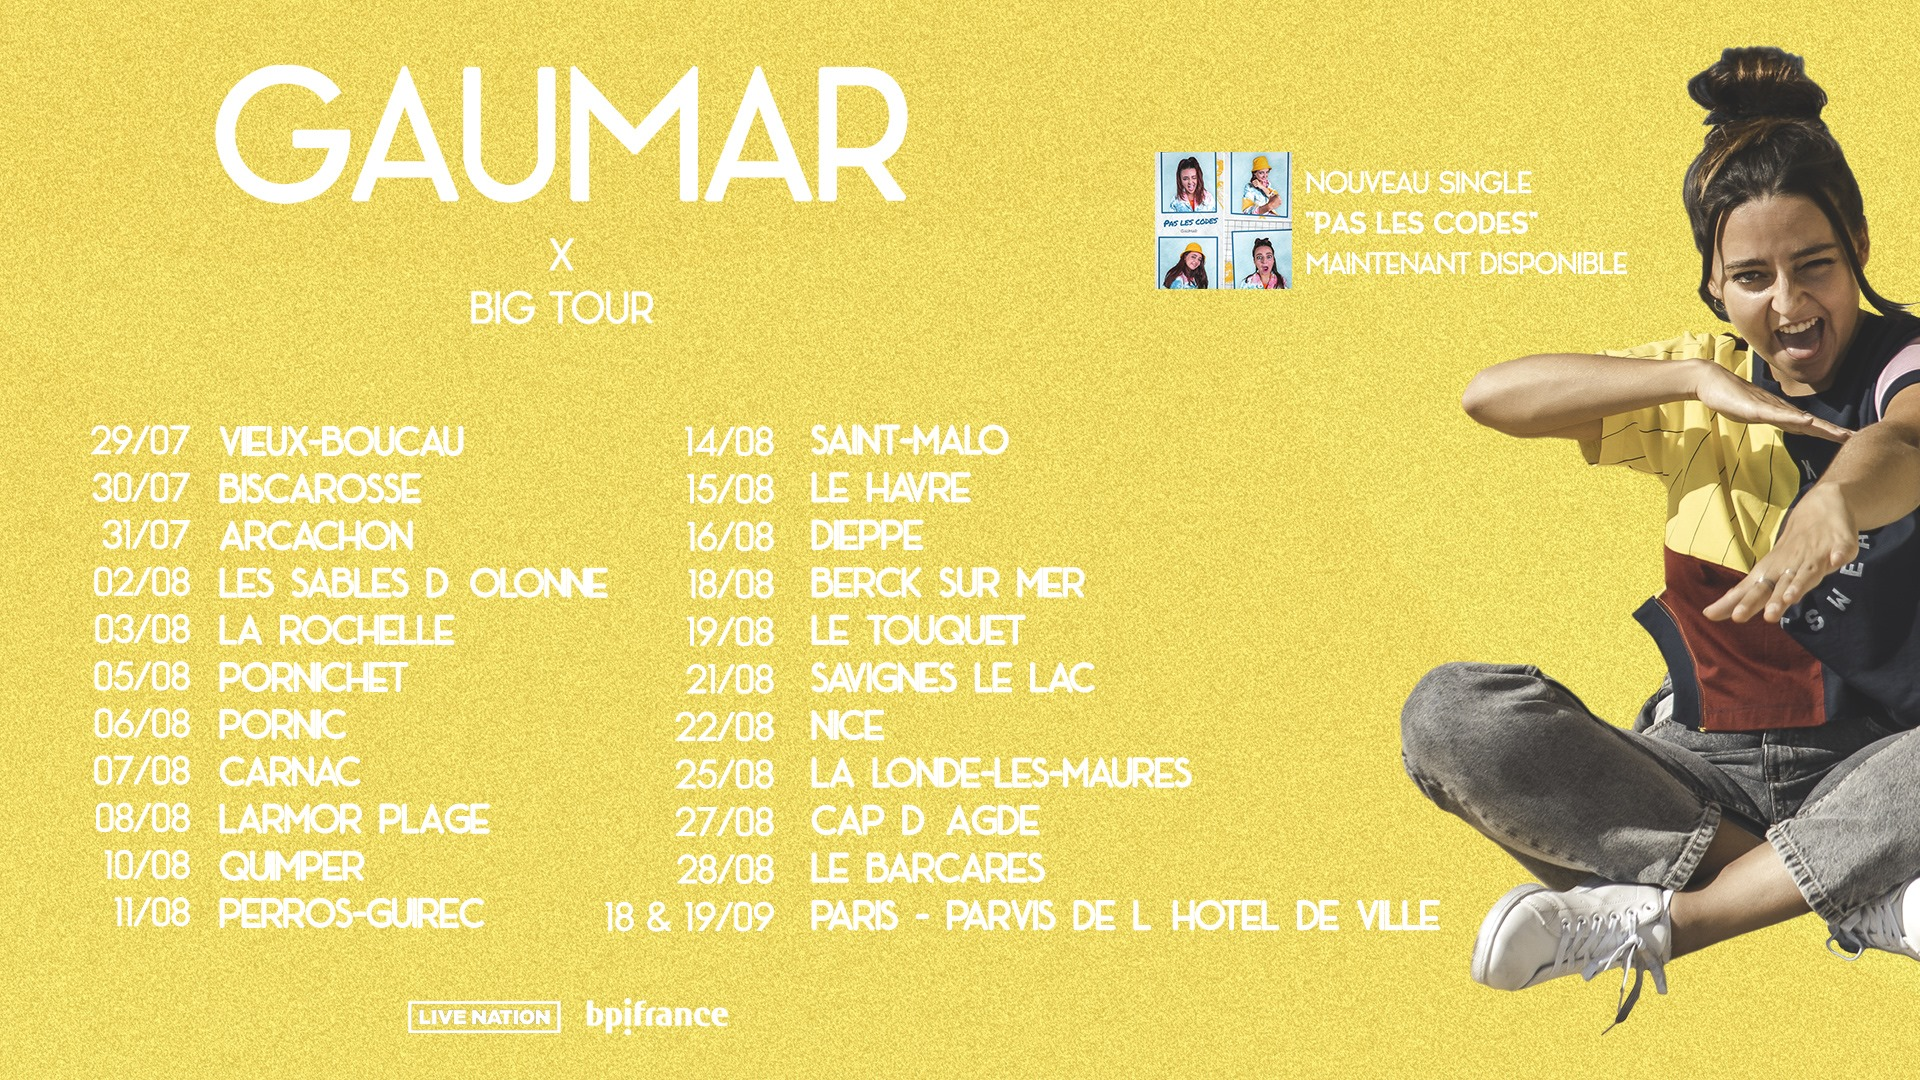 gaumar big tour summer 2020